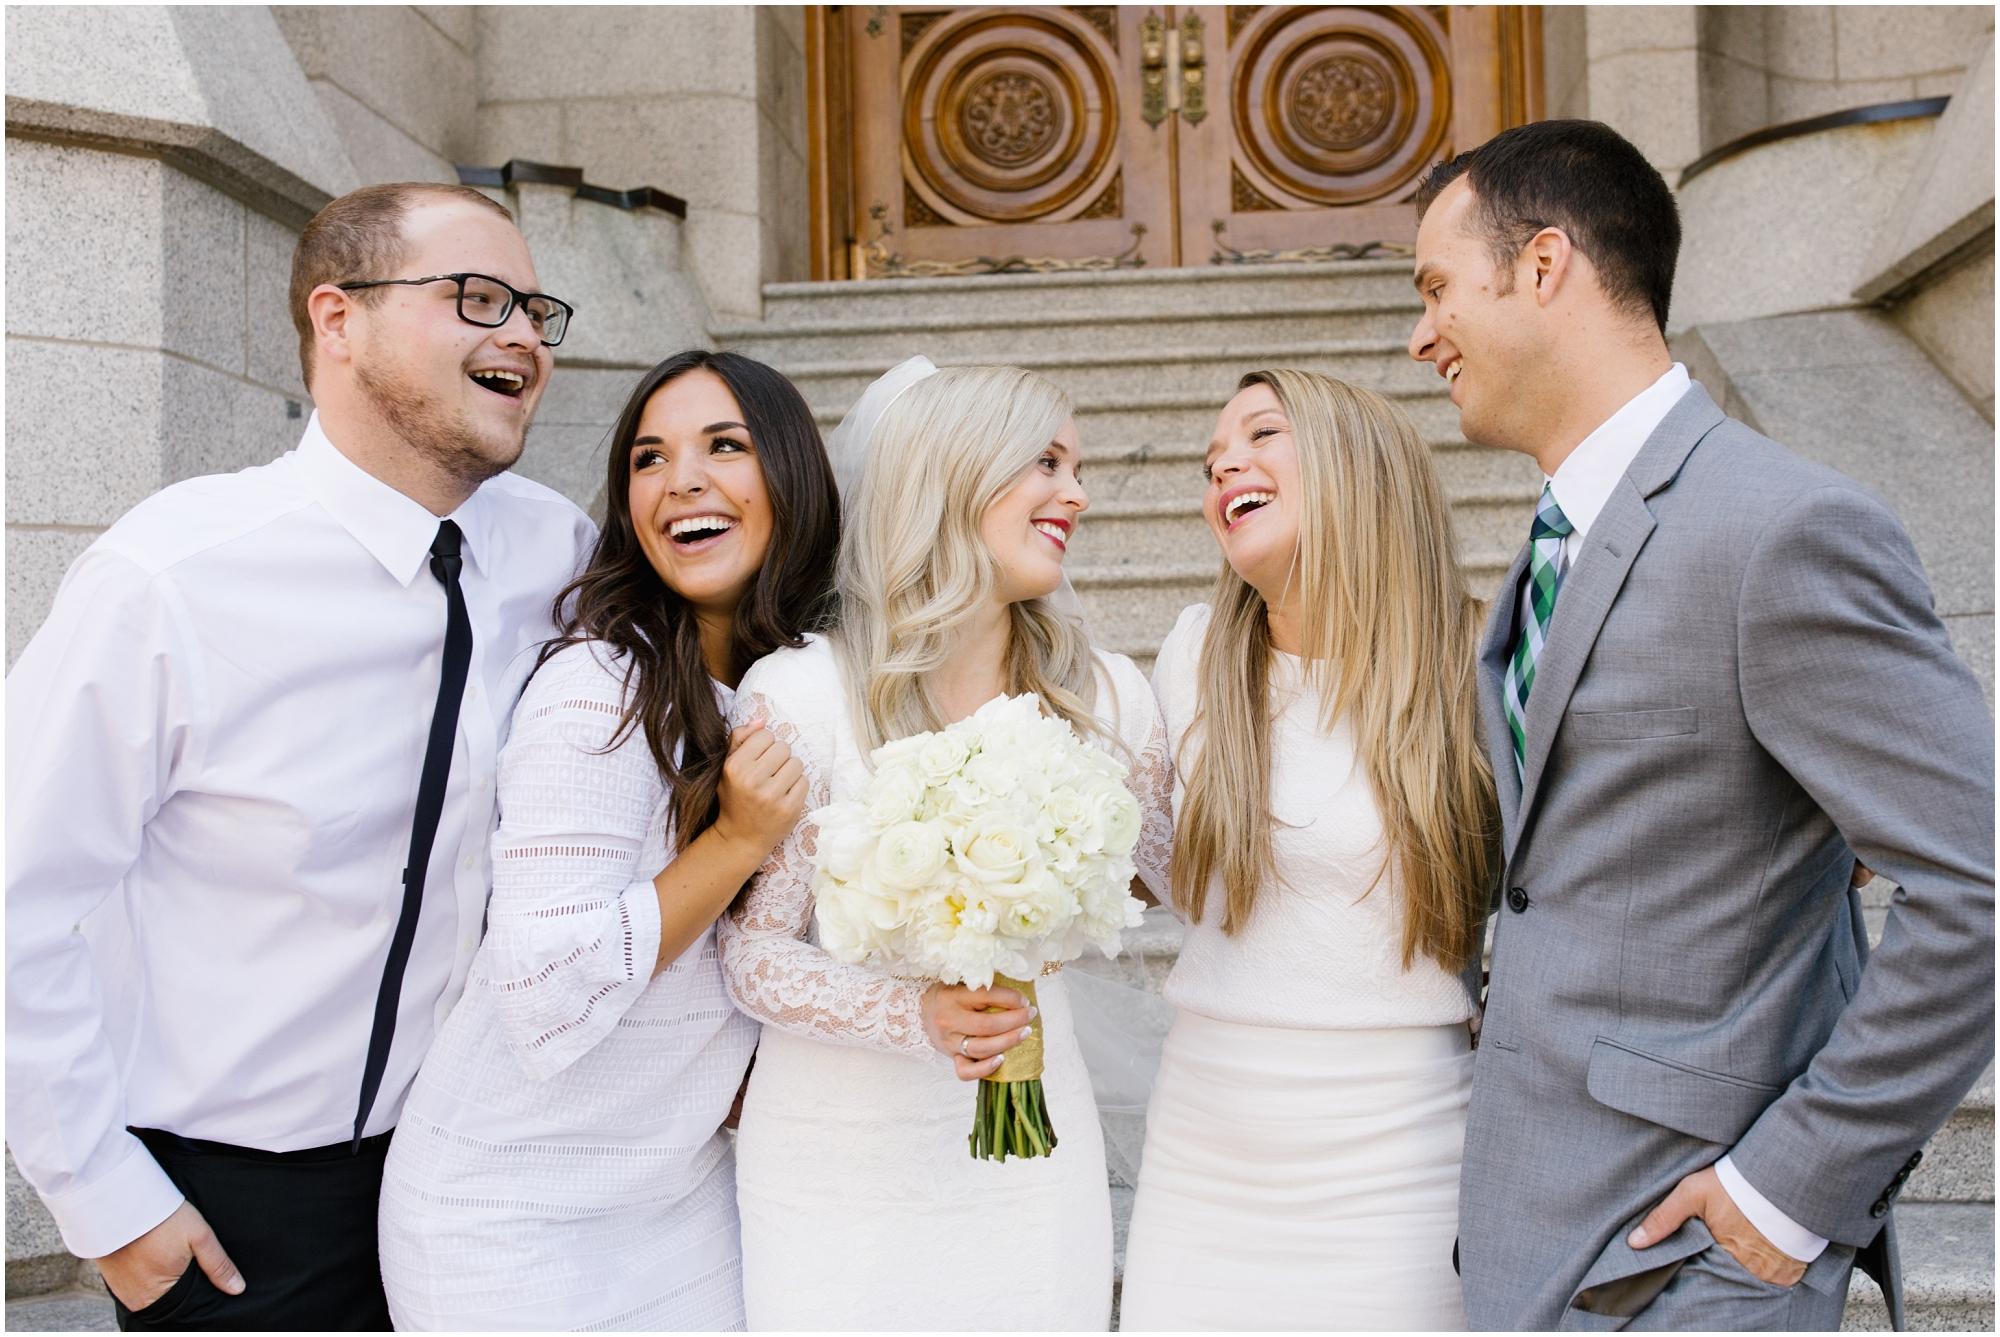 CherylandTyler-86_Lizzie-B-Imagery-Utah-Wedding-Photographer-Park-City-Salt-Lake-City-Temple-Wells-Fargo-Building.jpg